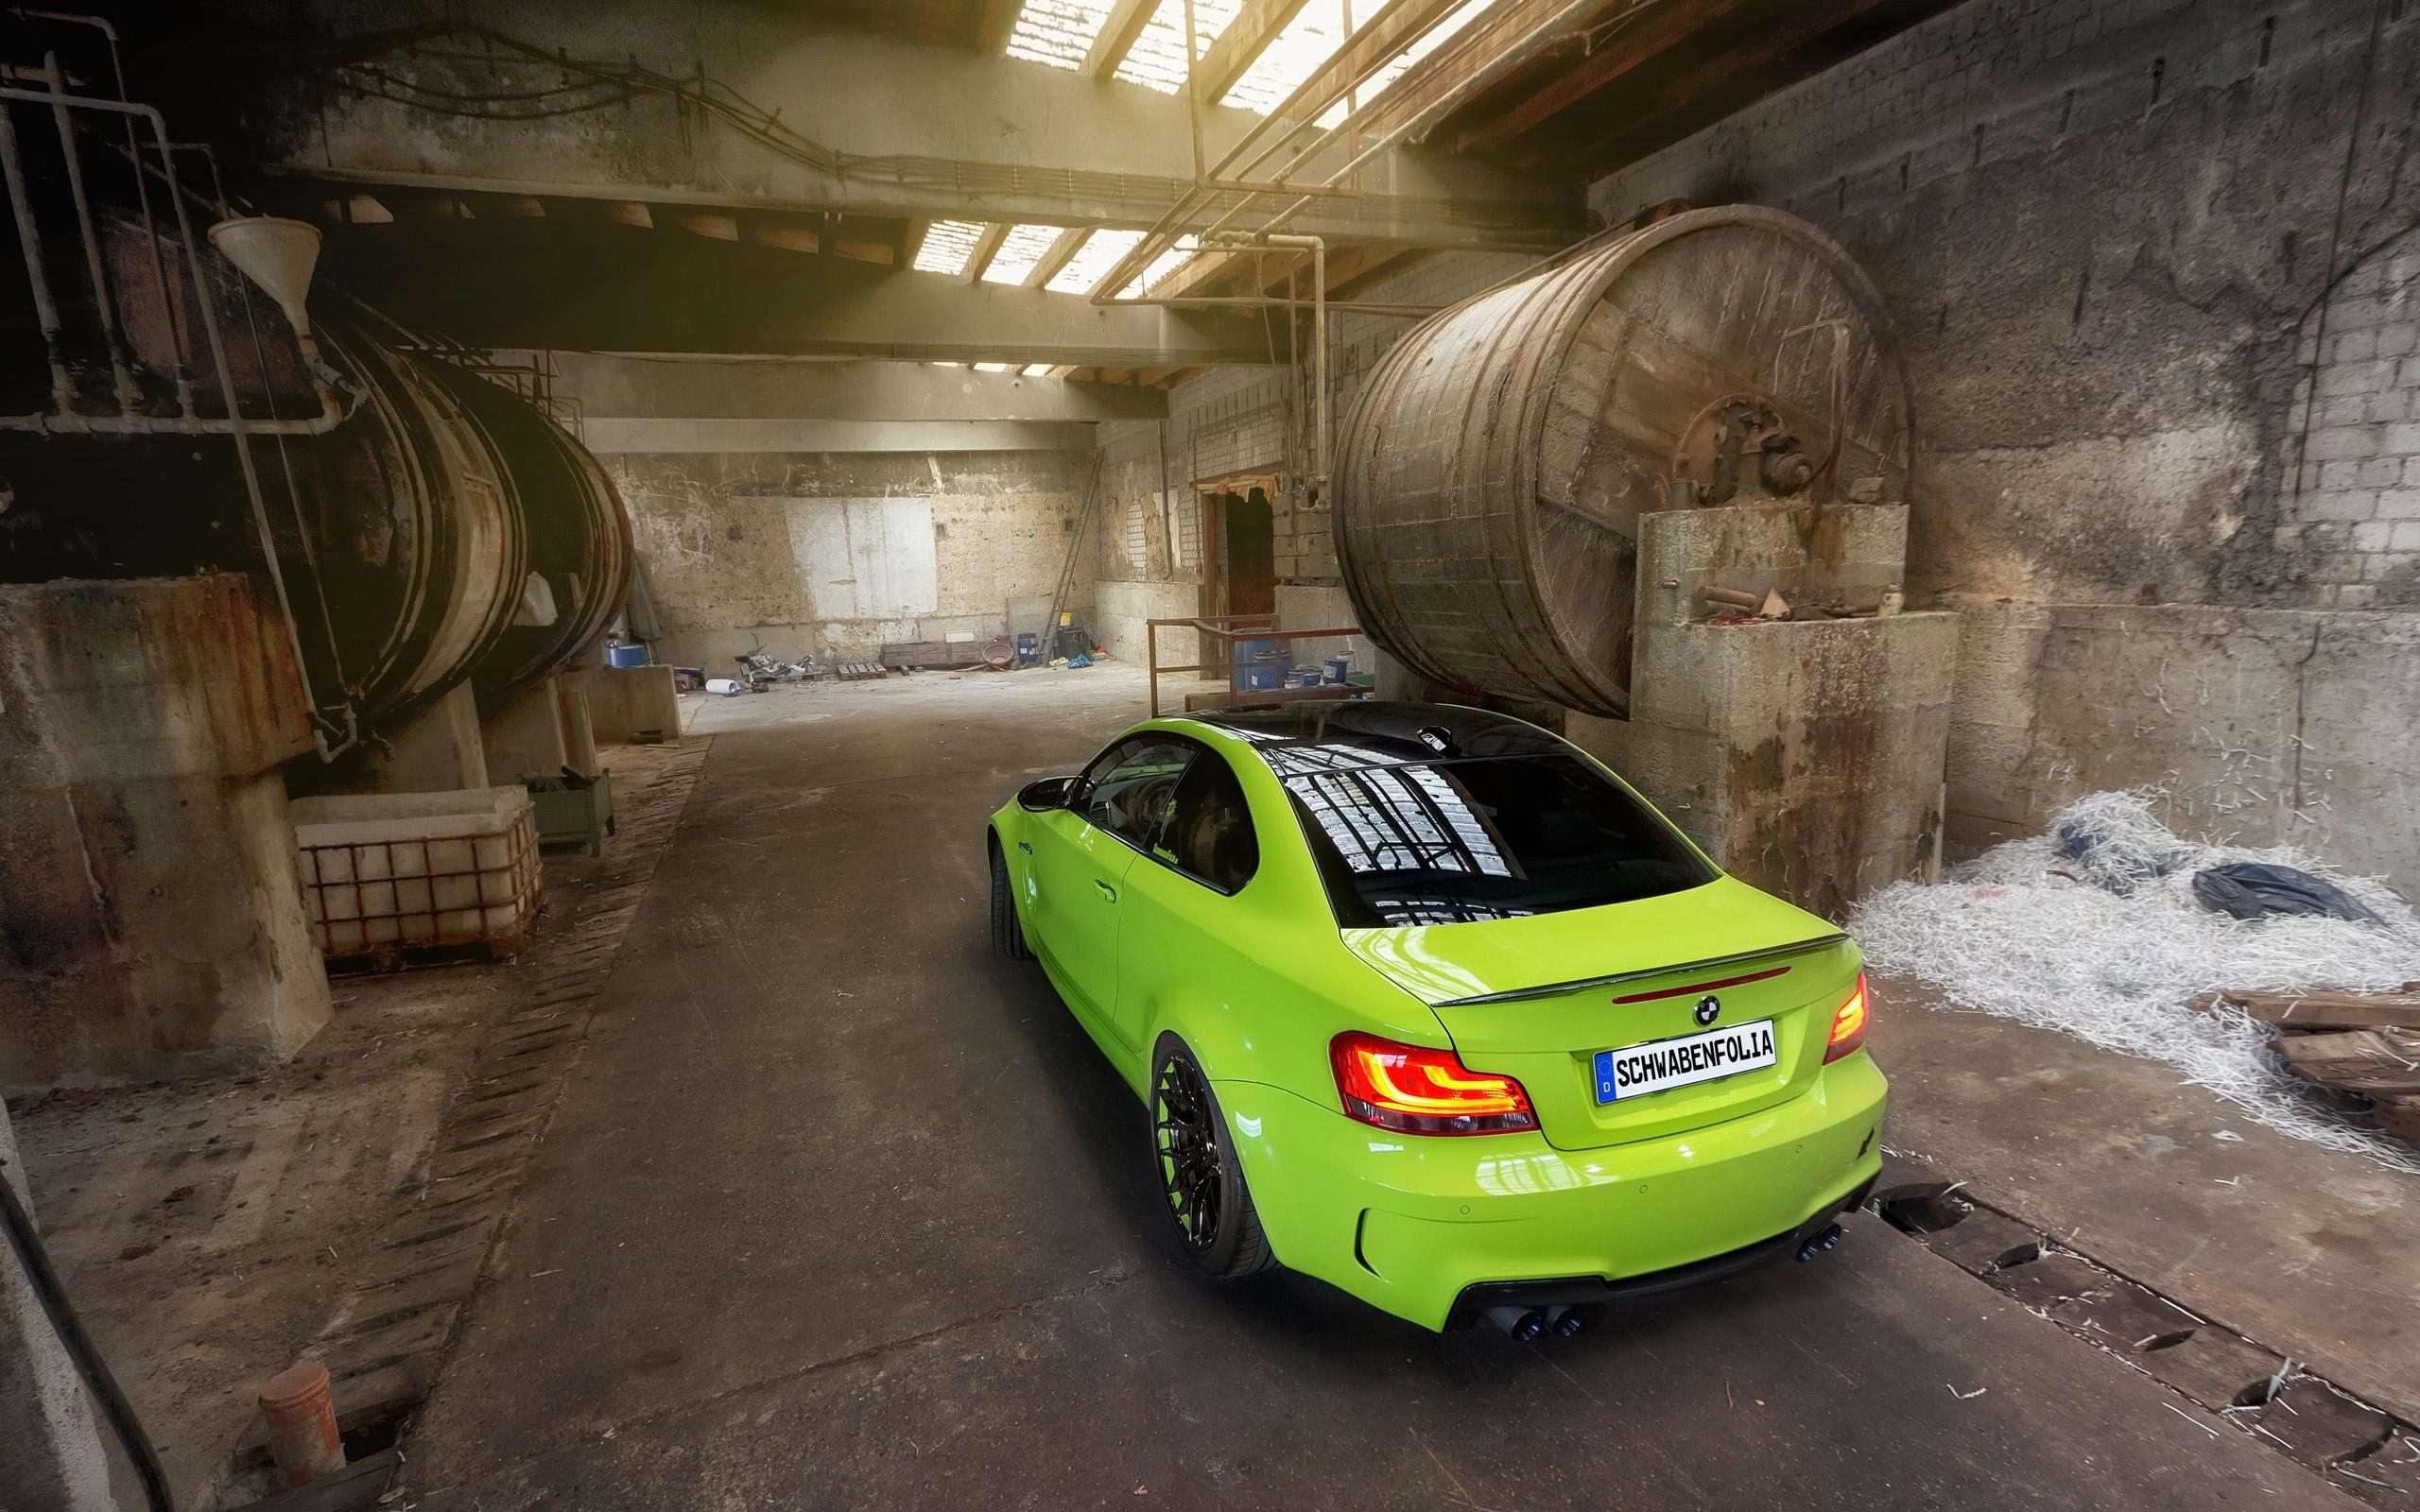 2013_SchwabenFolia_BMW_Series_1_M_Coupe_tuning___g_2560x1600.jpg